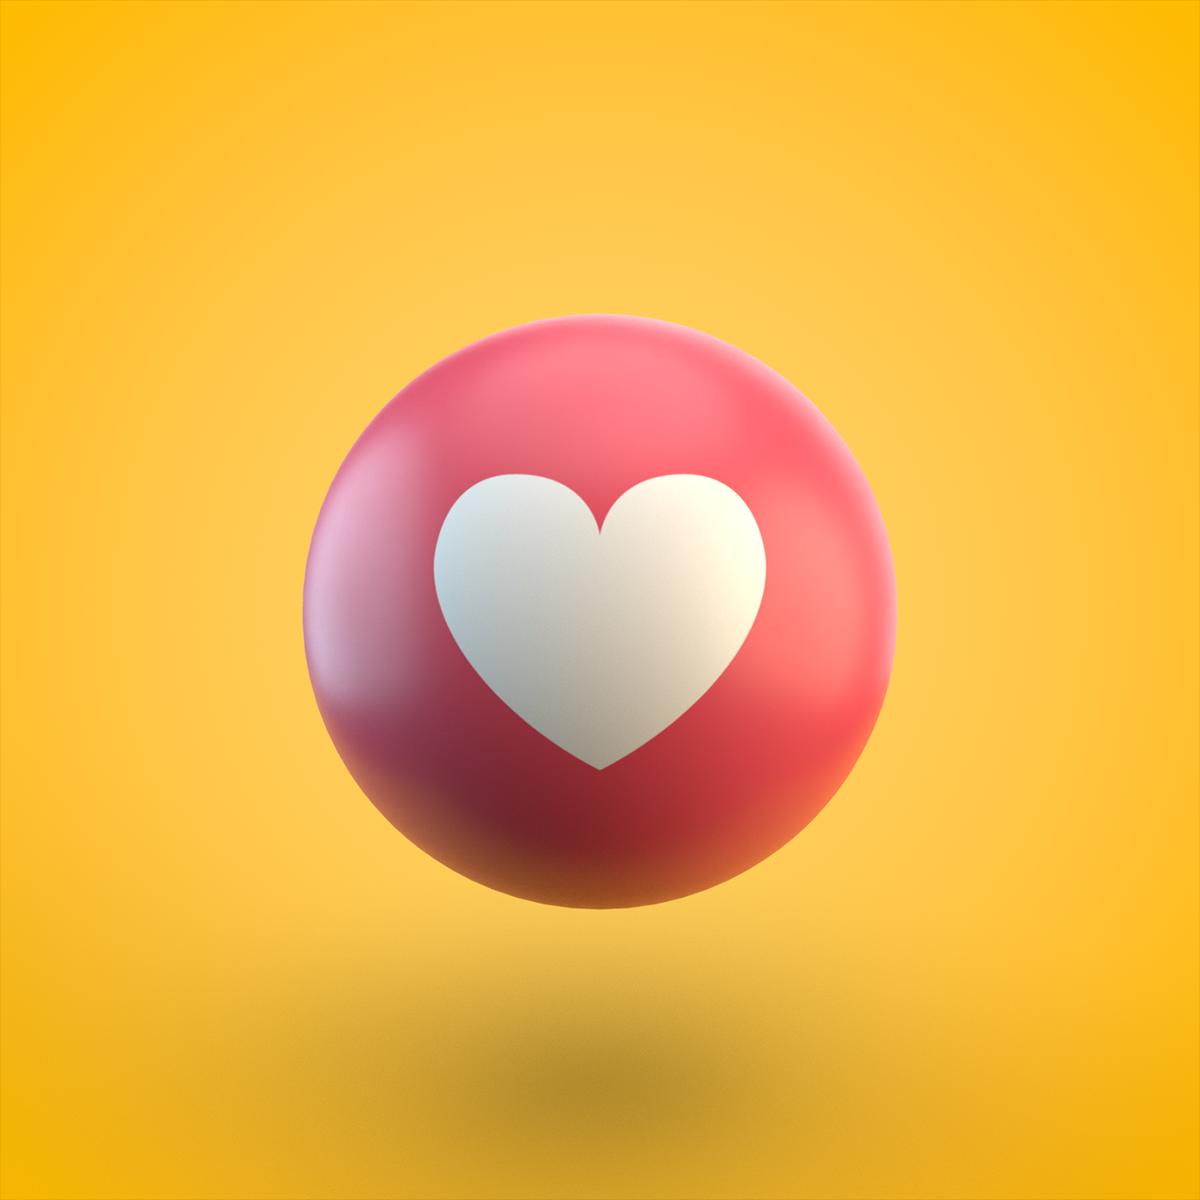 Ahmed Rabie On Behance Facebook Reaction 3d Emoji C4d Arnold Render Like Love Care Haha Wow Vector Art Design Digital Art Photography Emoji Images